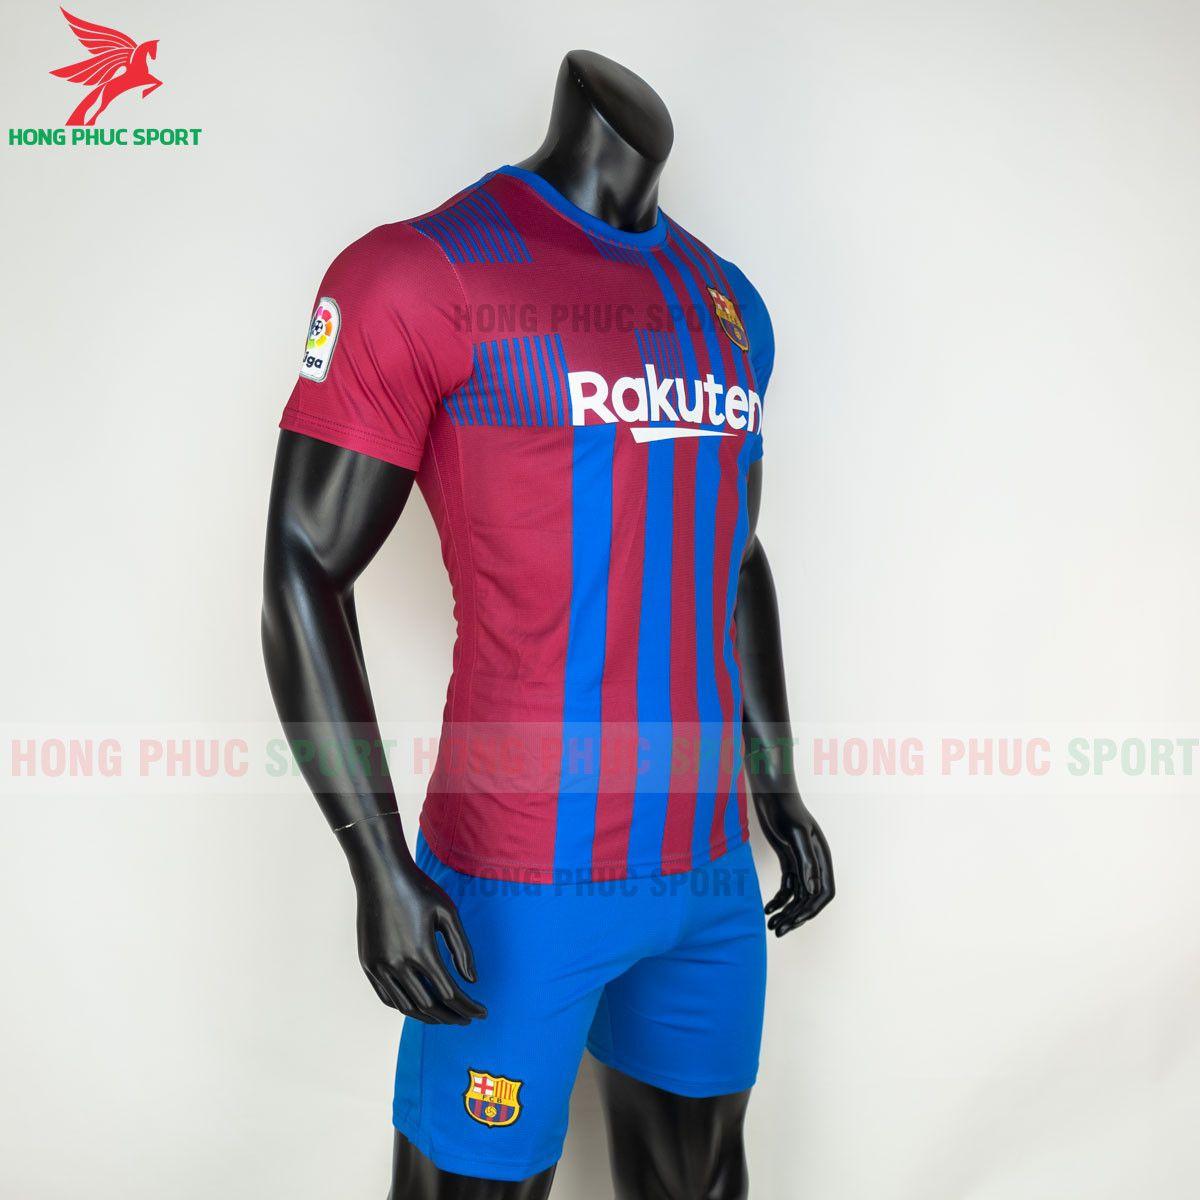 https://cdn.hongphucsport.com/unsafe/s4.shopbay.vn/files/285/ao-bong-da-barcelona-2021-2022-san-nha-hang-thai-6-60d2fcf256da4.jpg